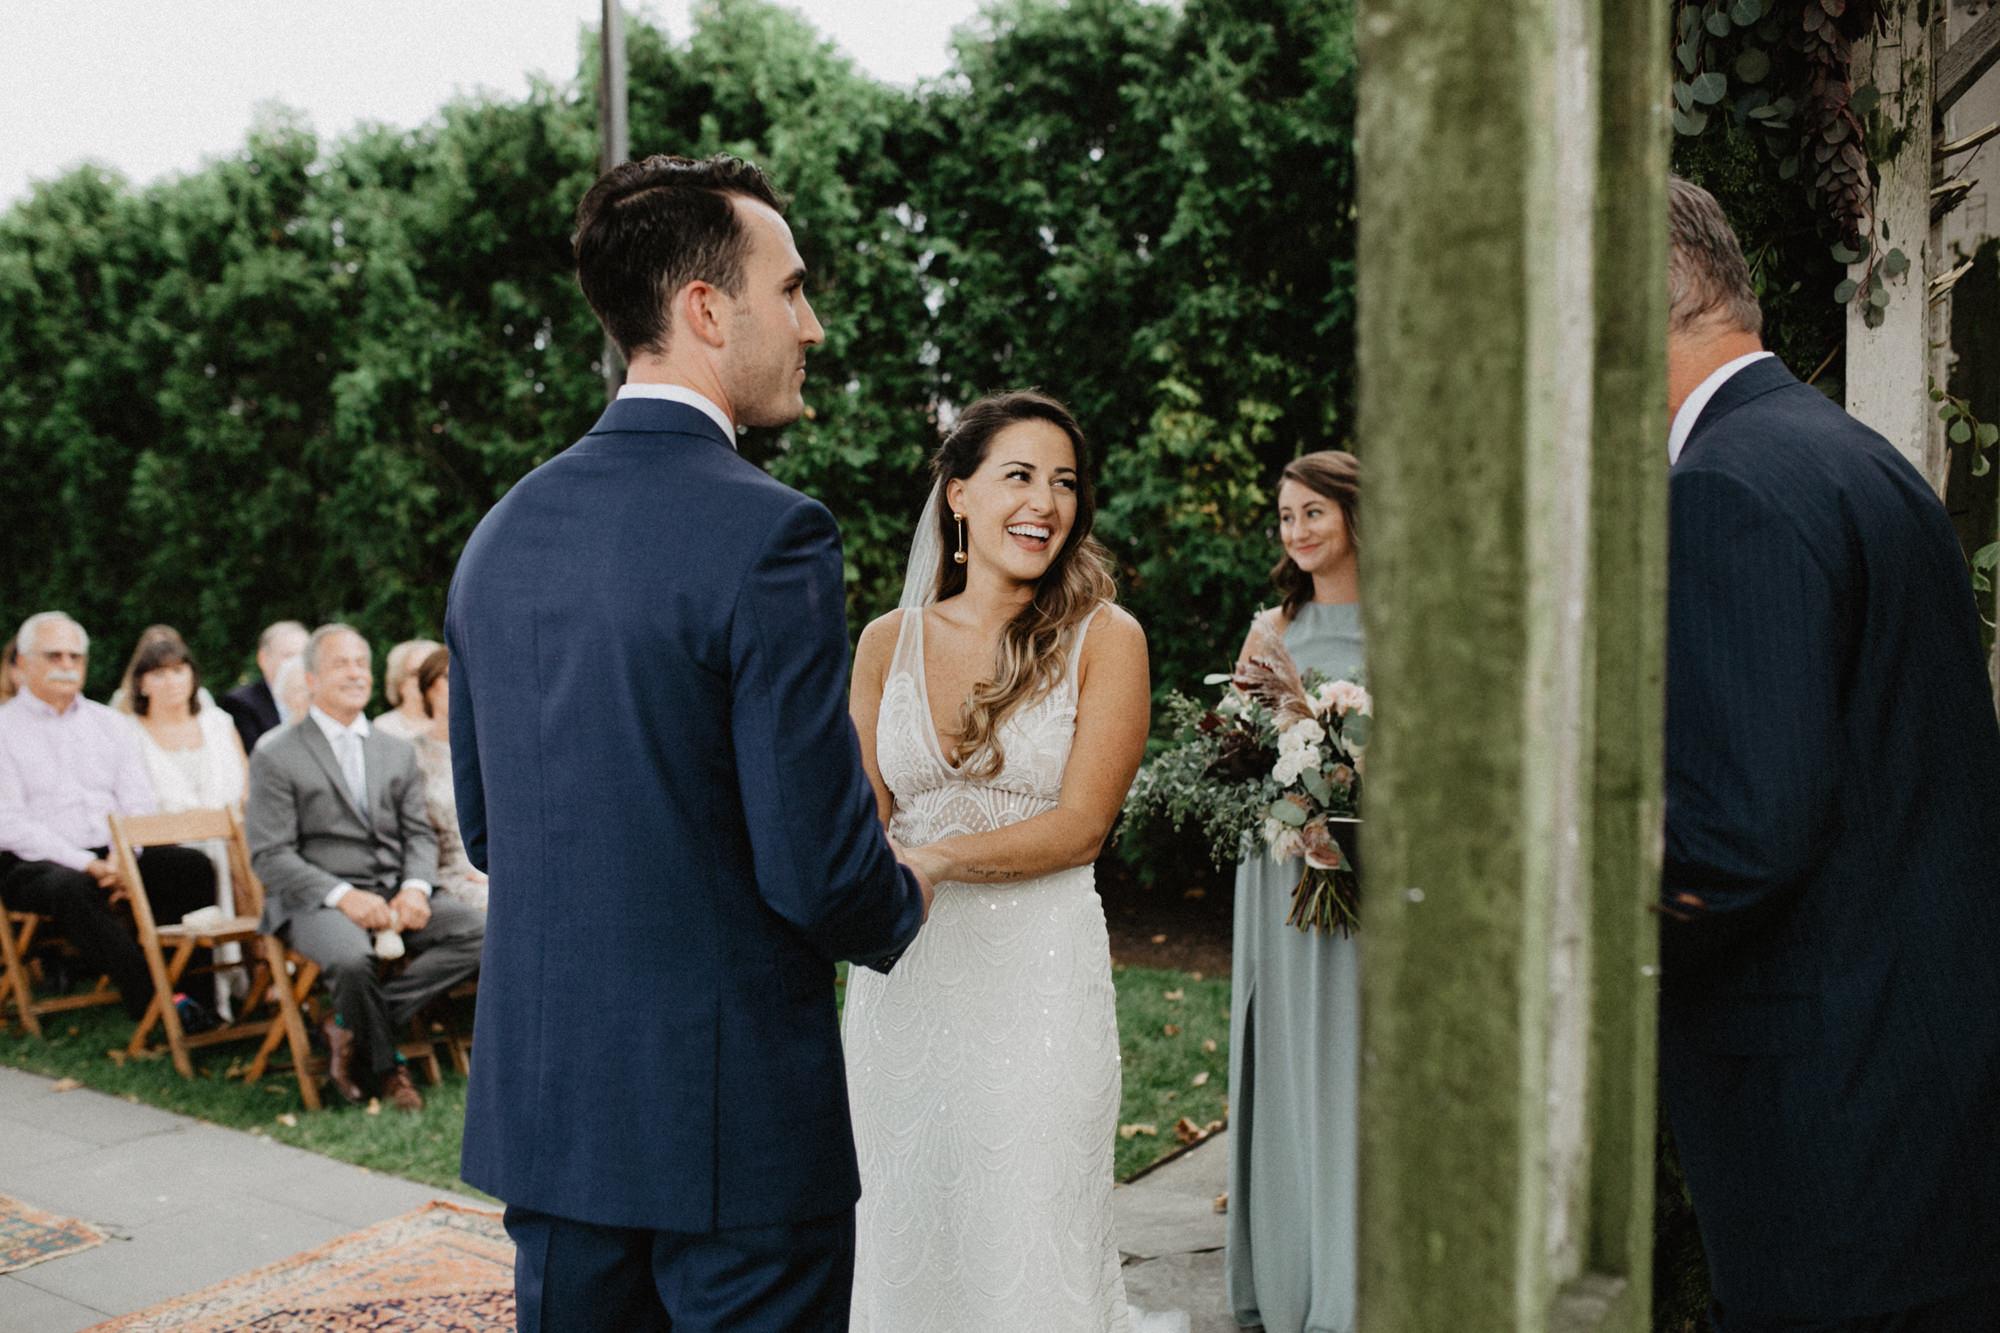 terrain-events-wedding-photographer-27.jpg